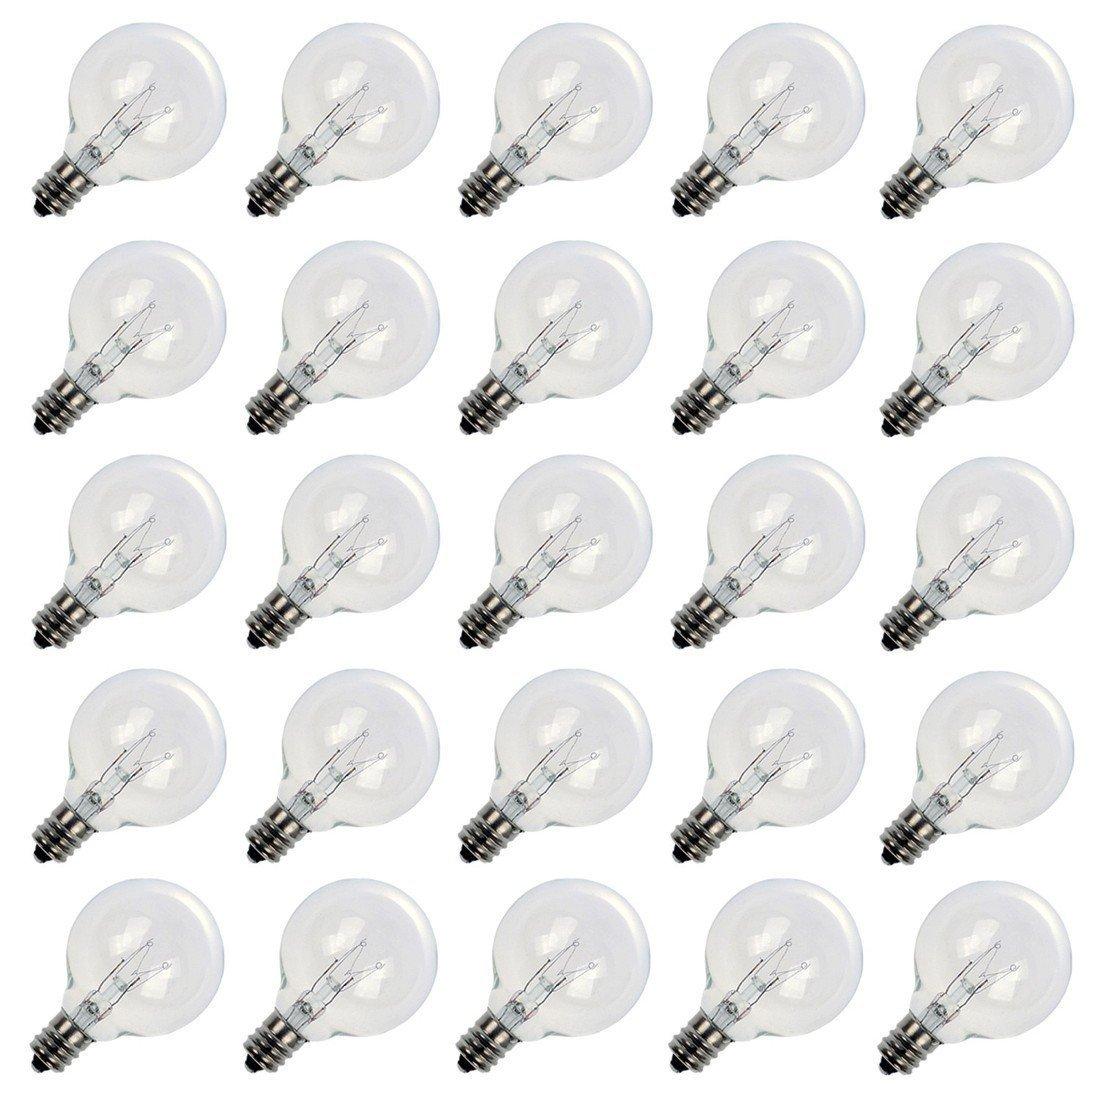 25 Pack Clear G40 Globe Bulbs With Candelabra Screw Base, E12 Candelabra Base Light Glass Bulbs